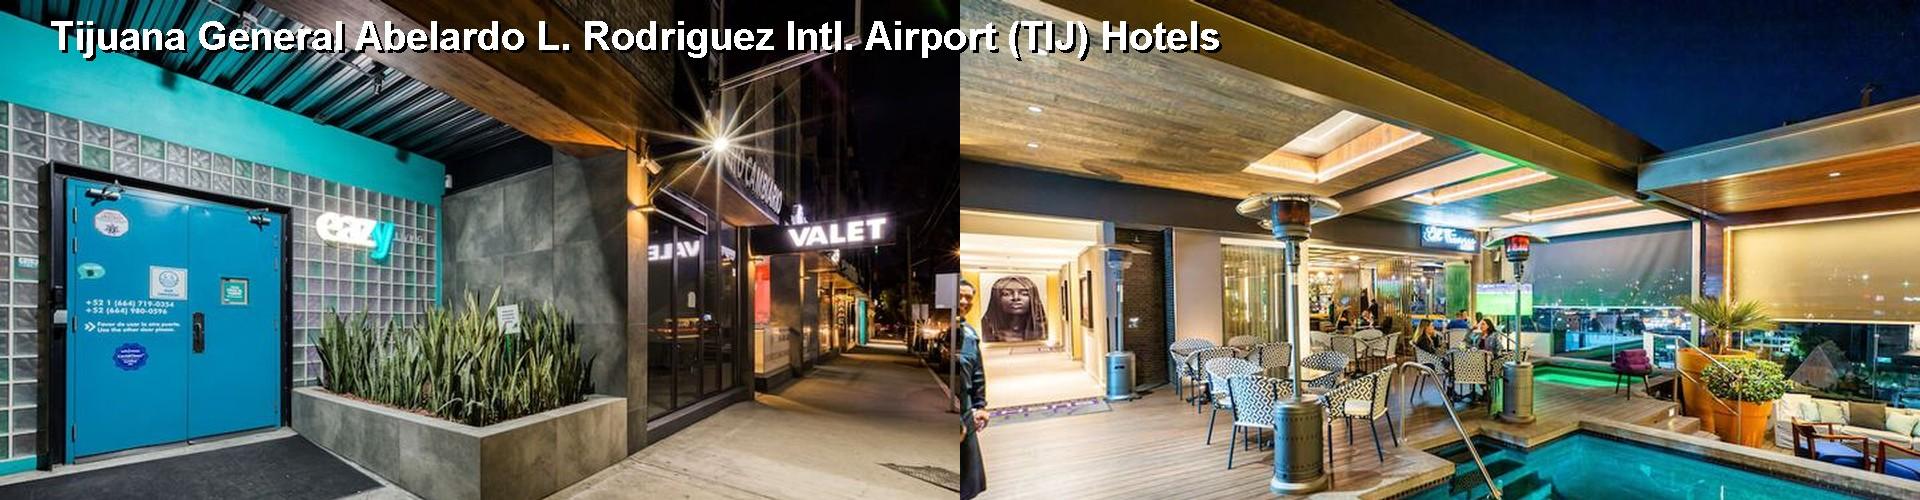 5 Best Hotels Near Tijuana General Abelardo L Rodriguez Intl Airport Tij